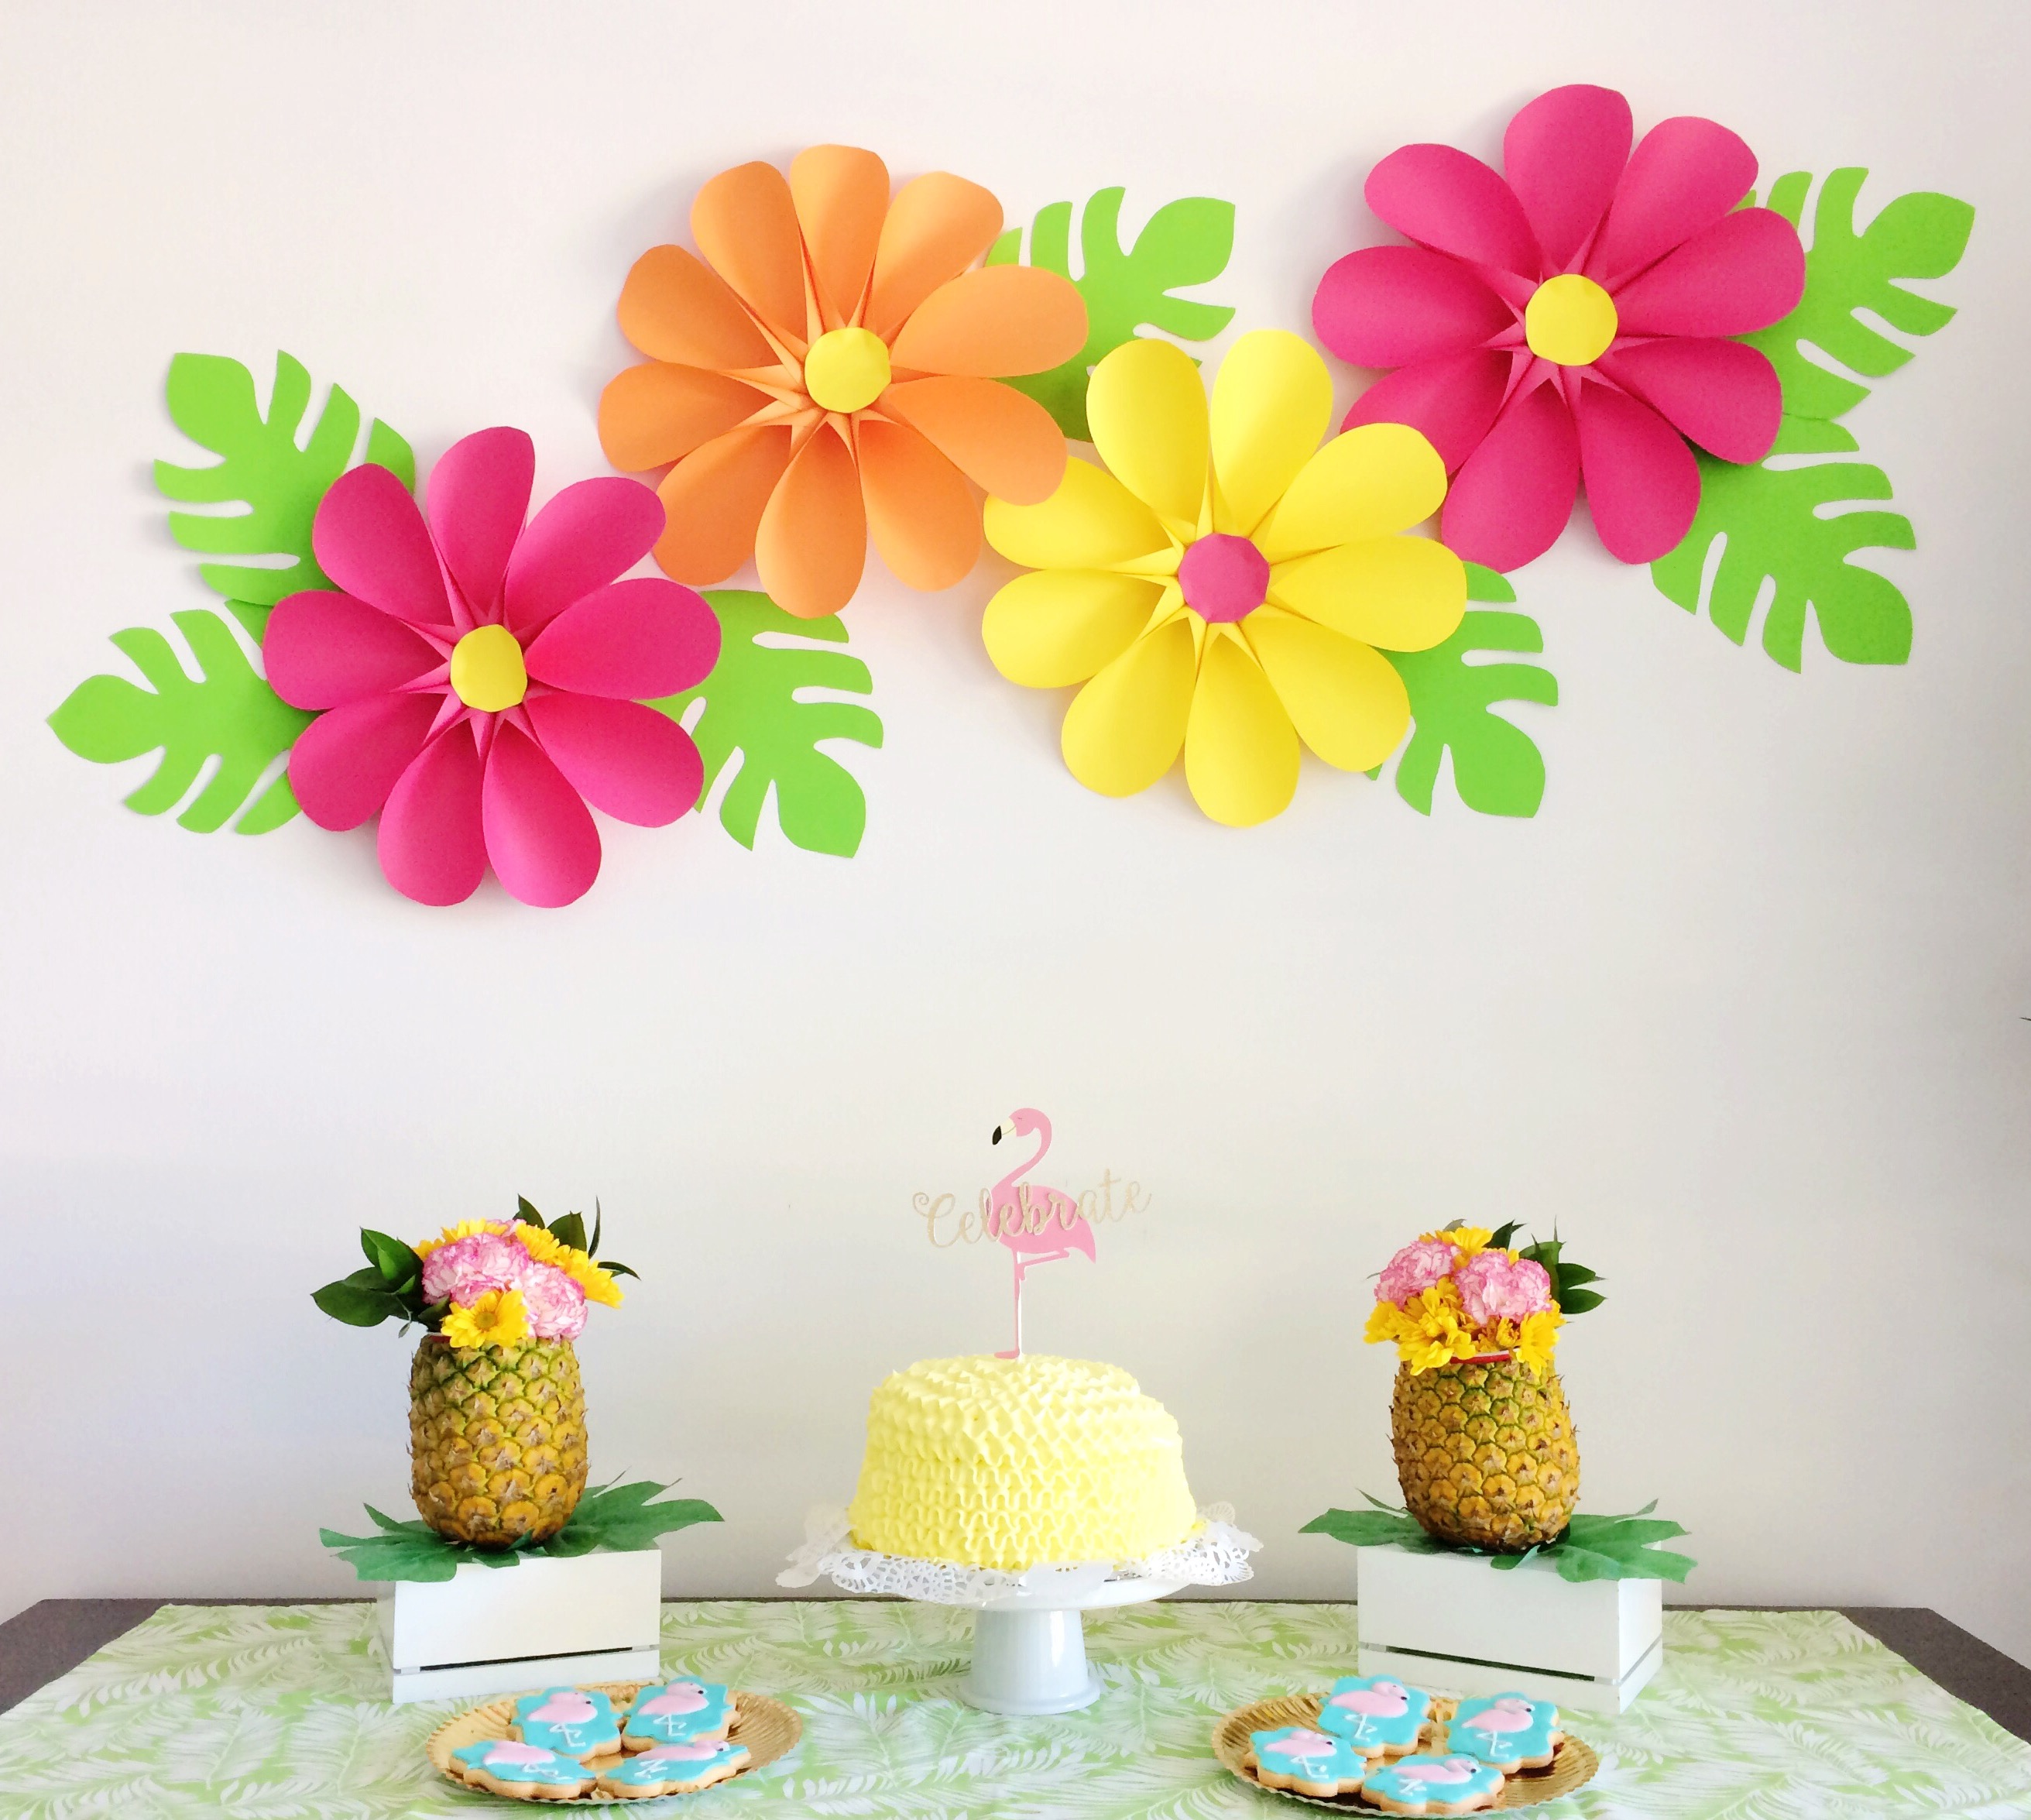 palms-spring-cake-station-3